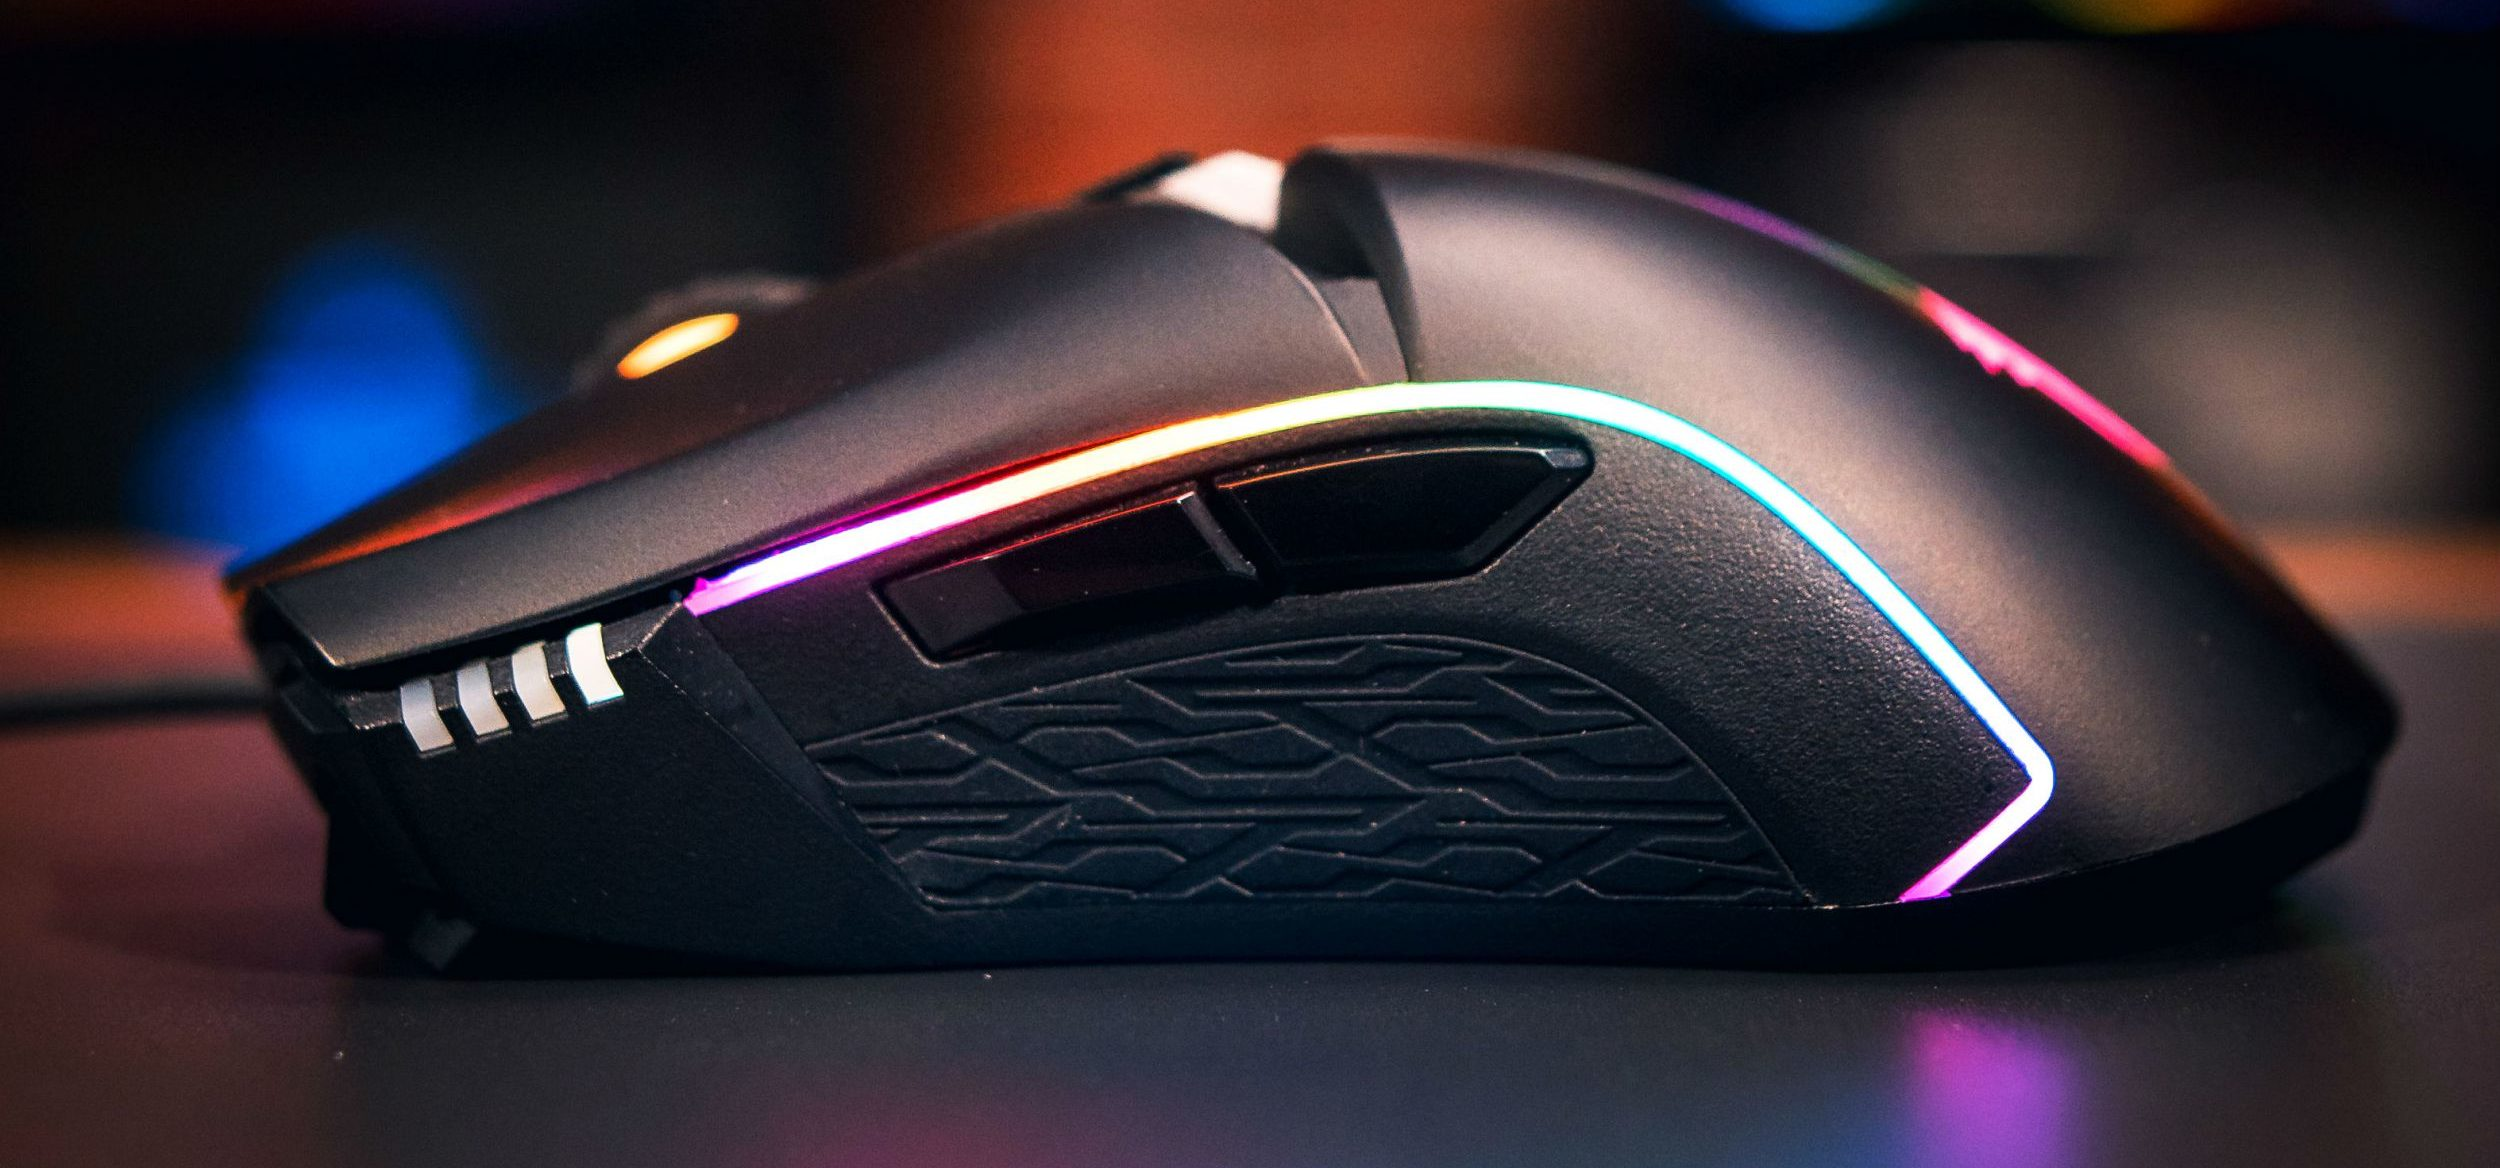 Comment utiliser une souris gamer